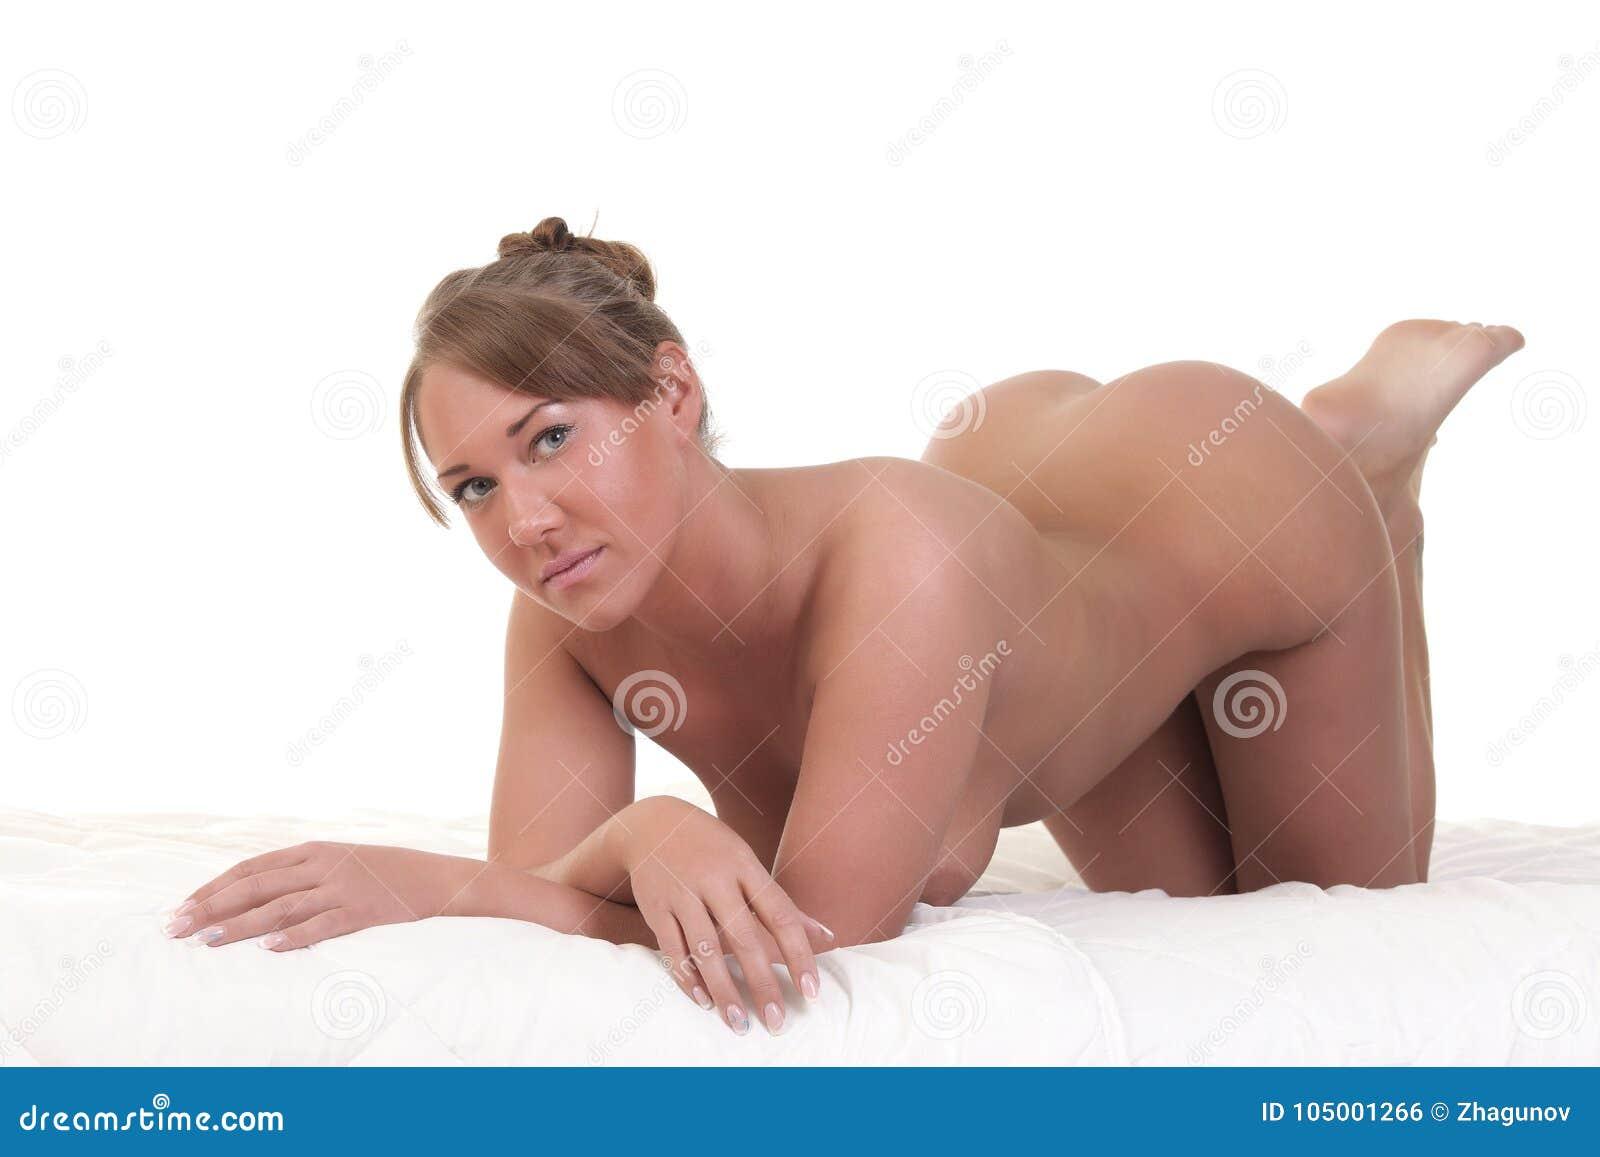 Bilder av nakna kvinnor